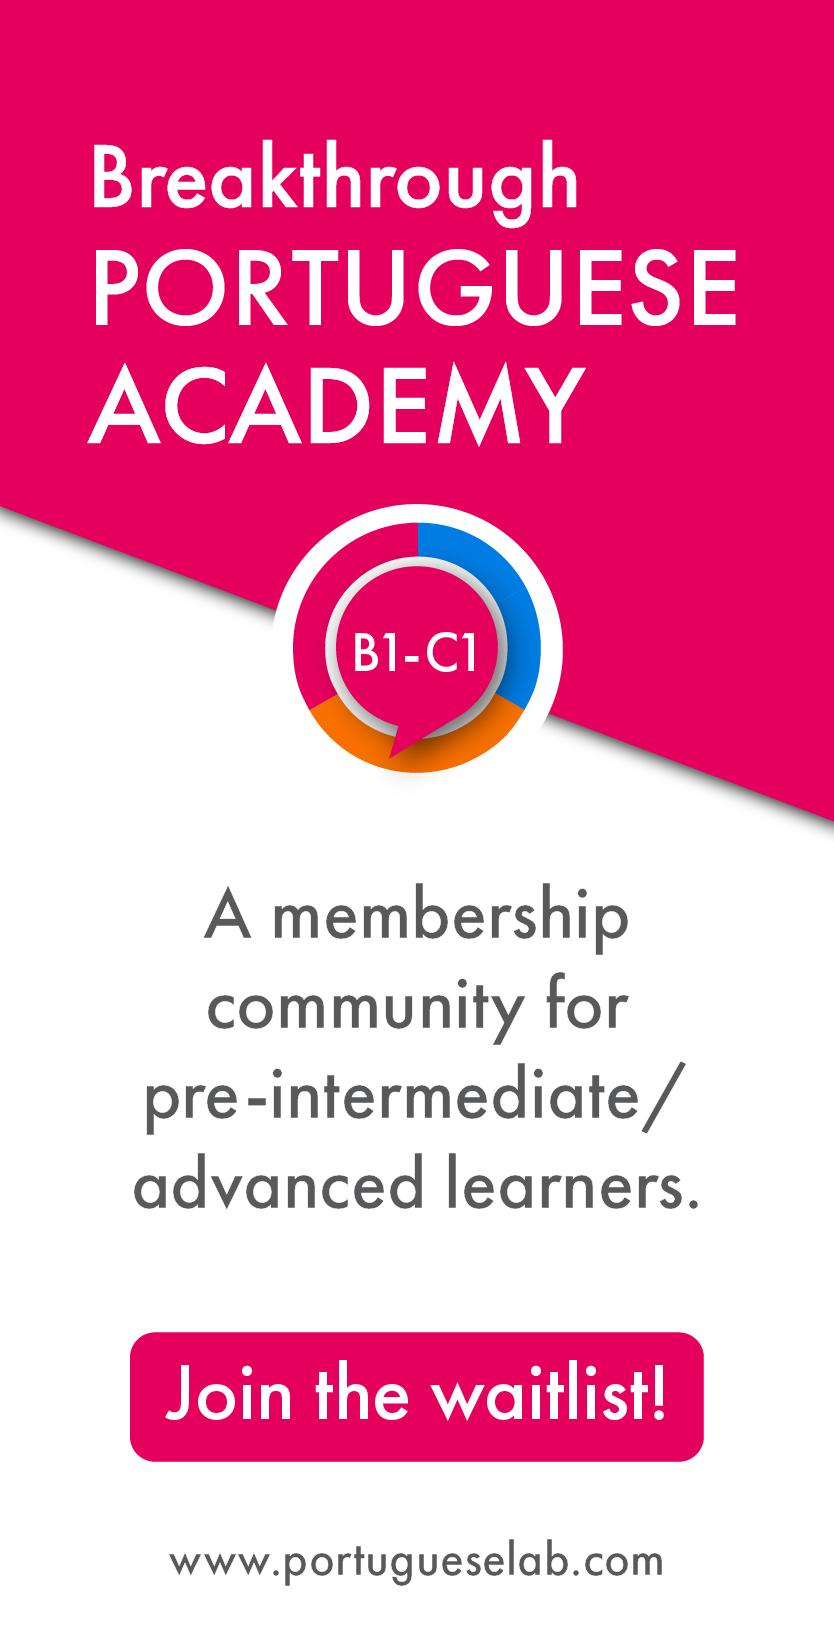 Breakthrough Portuguese Academy.jpg